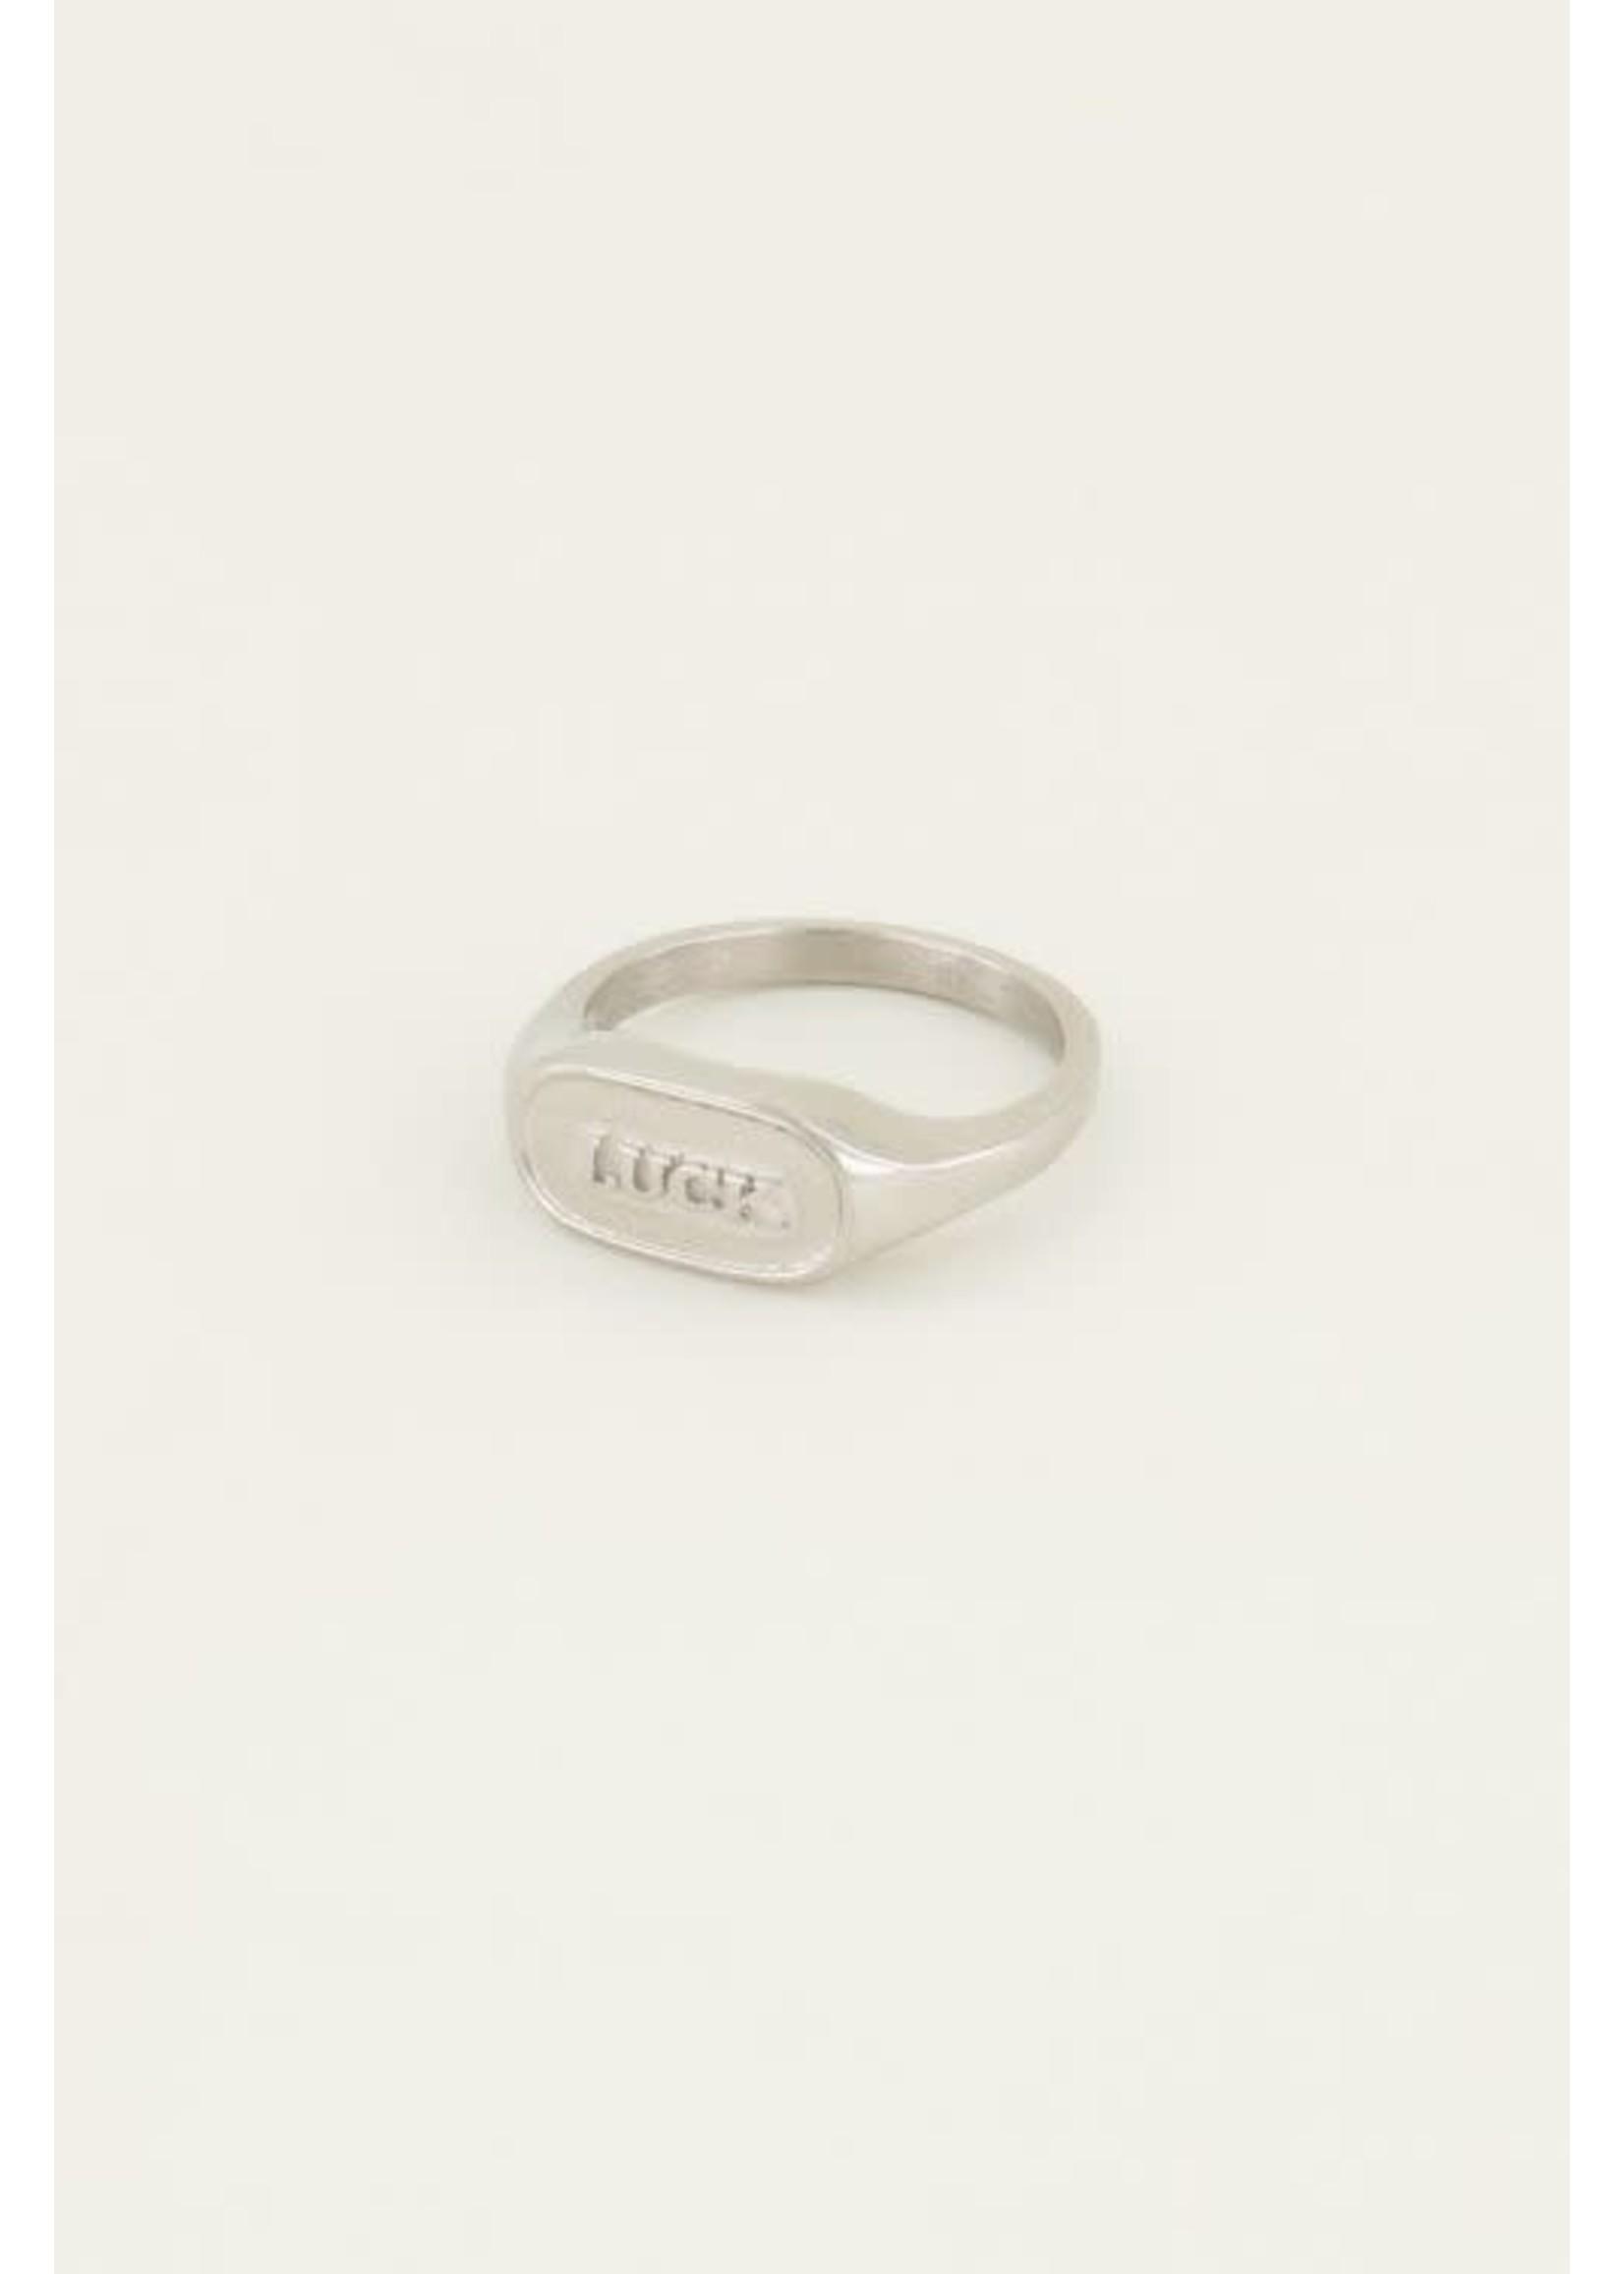 My Jewellery Ring luck